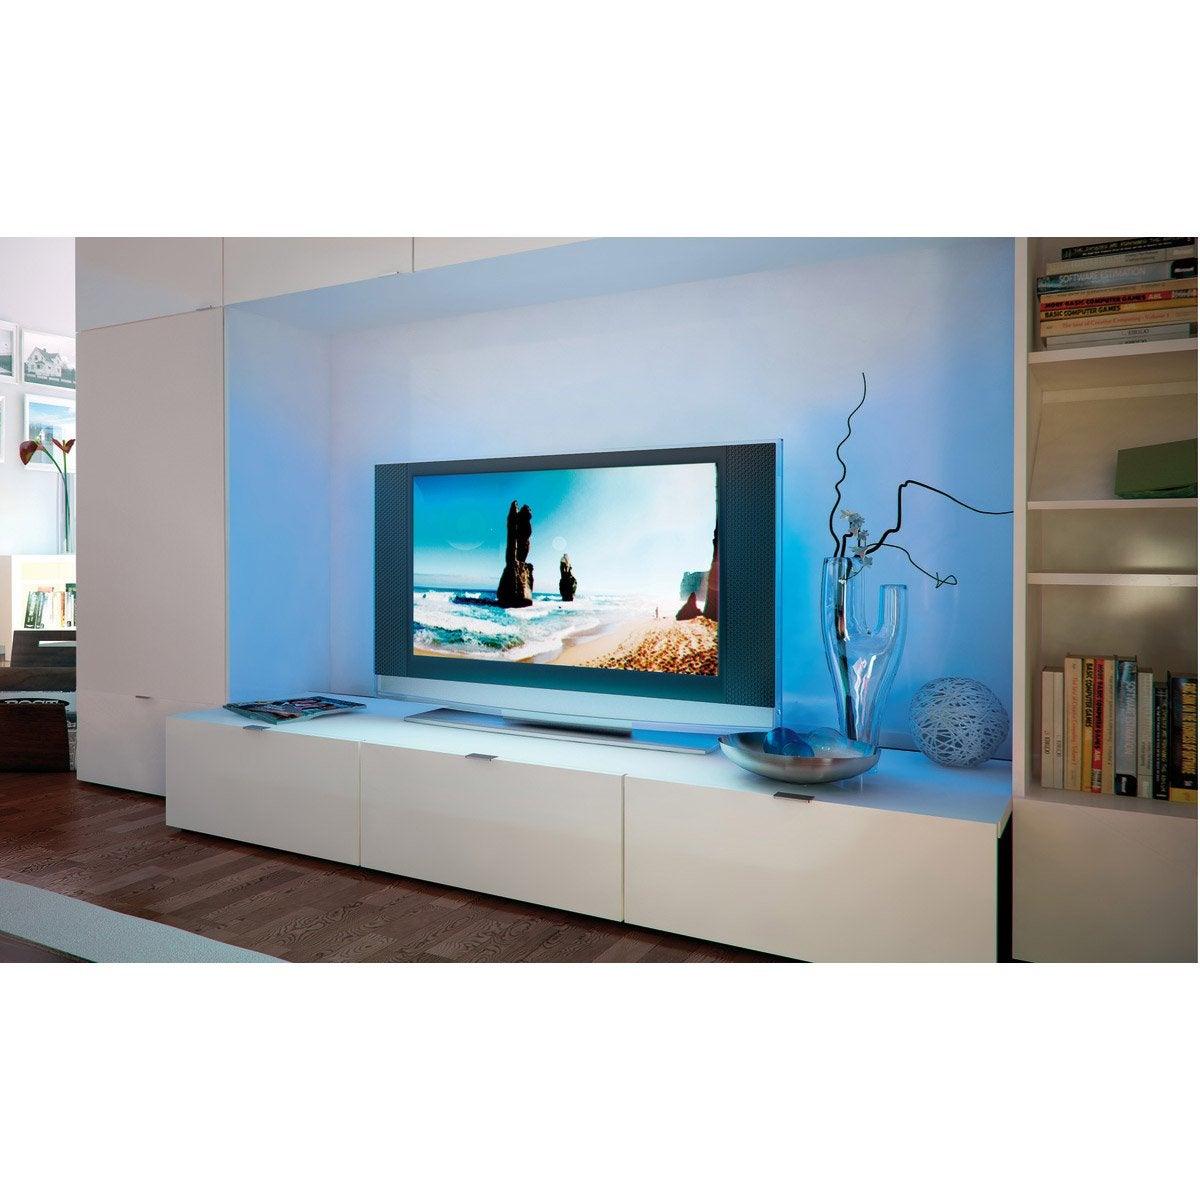 Ruban Led Tv 2 X 0 5m Multicolore 3000k Paulmann Leroy Merlin # Panneau Melamine Derriere La Tele